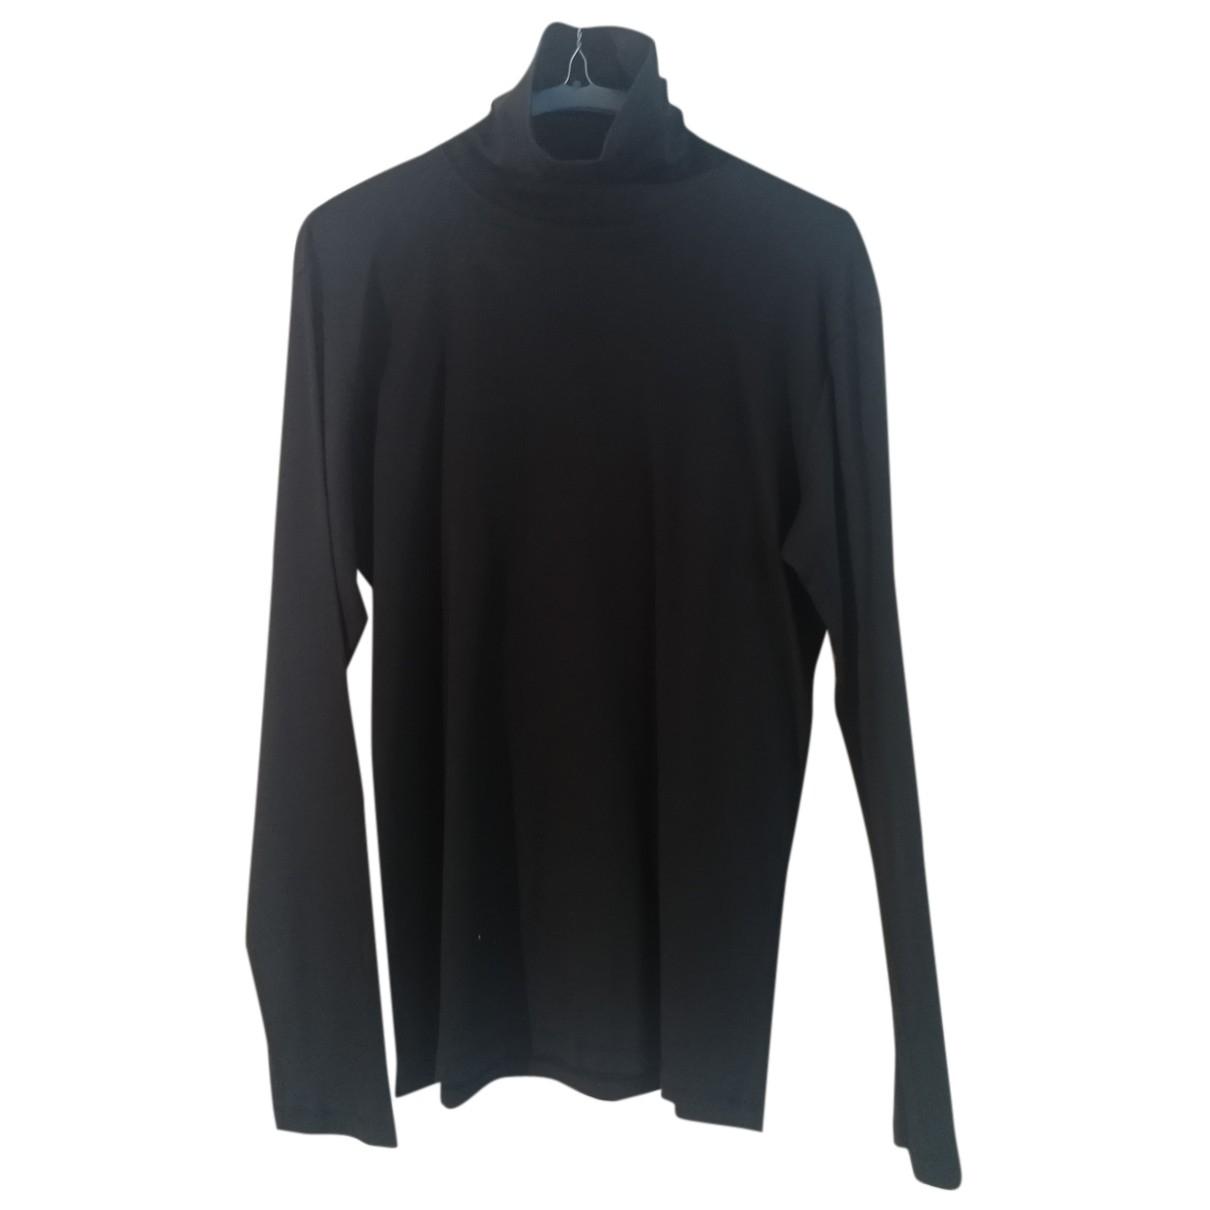 Lemaire N Blue Cotton Knitwear & Sweatshirts for Men L International